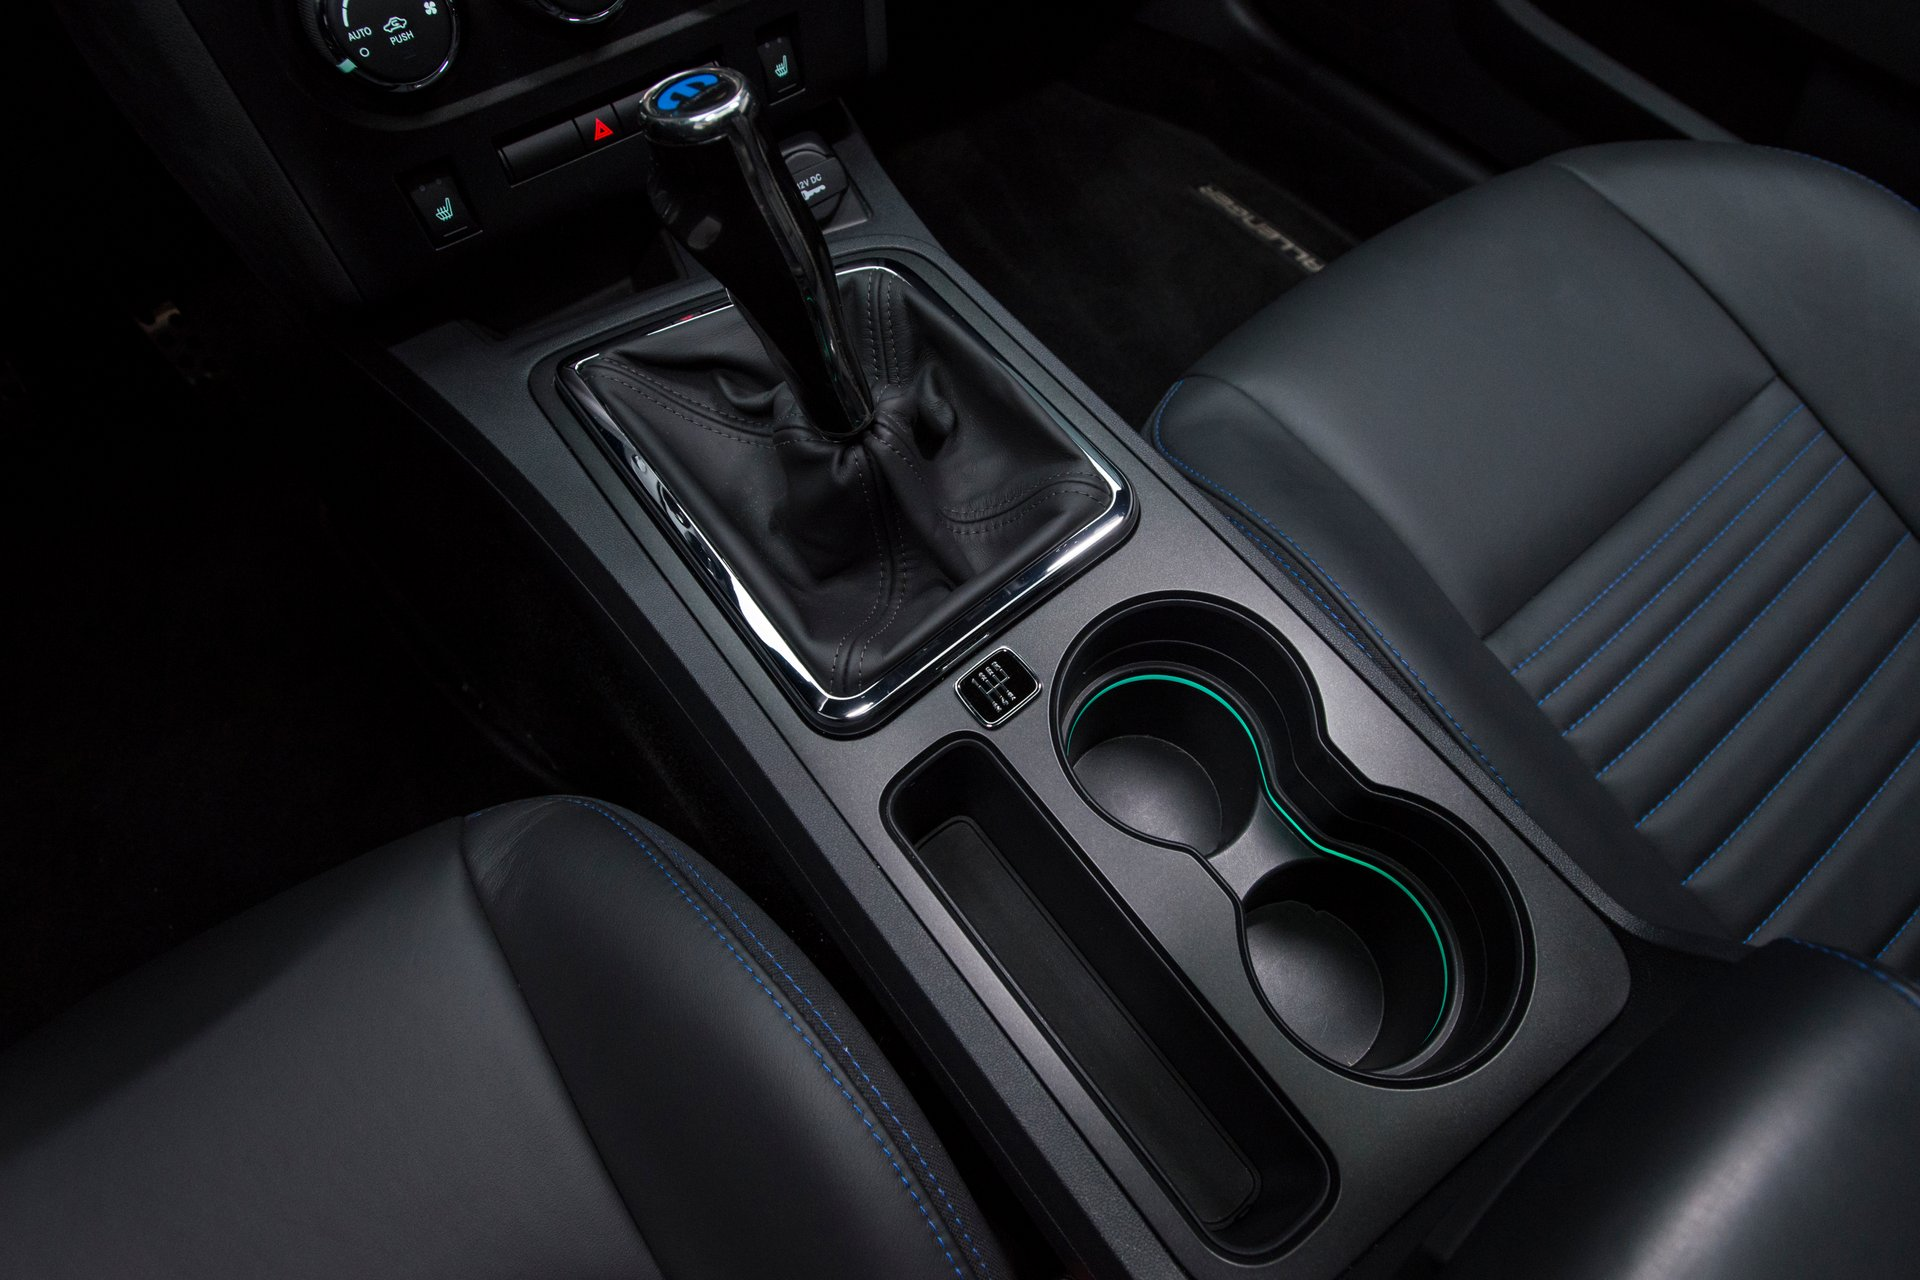 2014 Dodge Challenger R/T Mopar '14 Shaker for sale #90125 | MCG